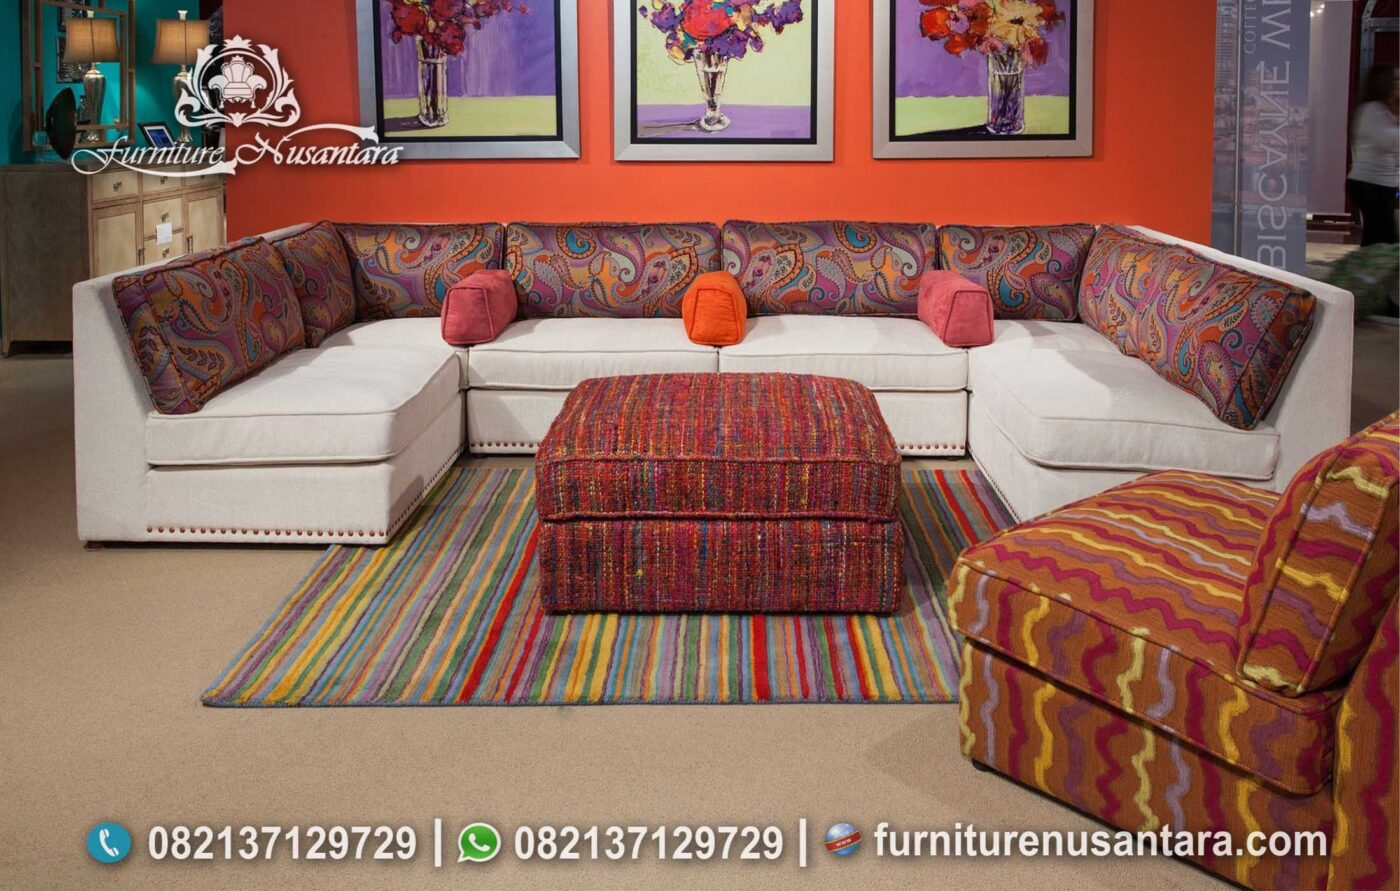 Sofa Tamu Minimalis Letter U ST-97, Furniture Nusantara